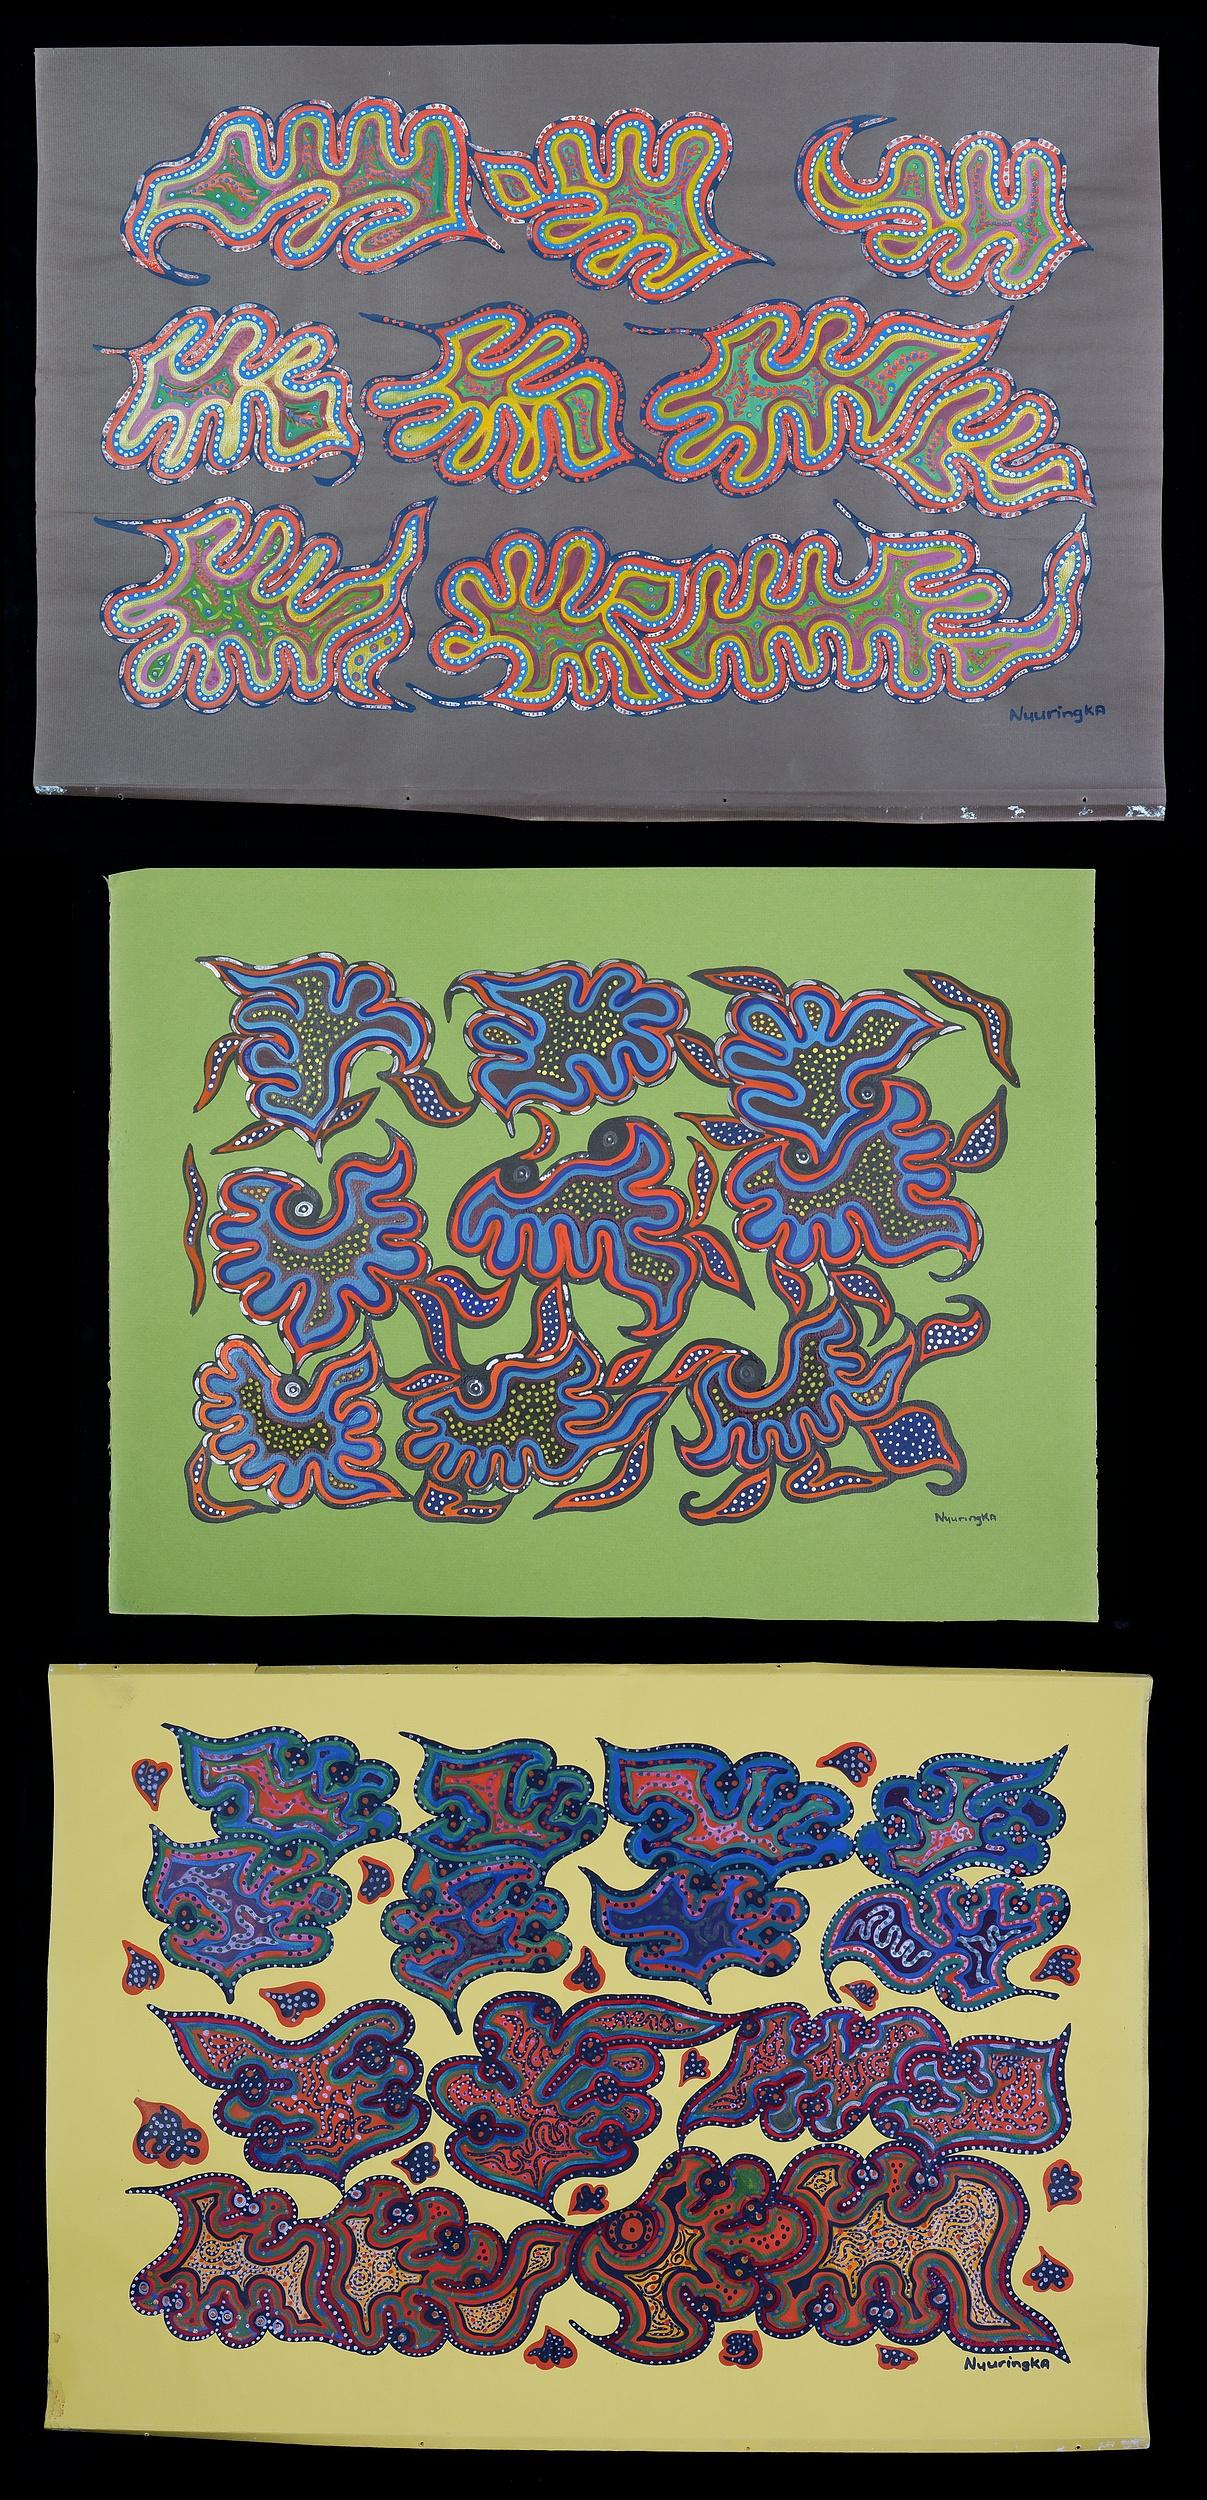 'Nyuringka (working late 1960s, Pitjantjatjara language group), Three Untitled Works, Gouache on Paper (3)'